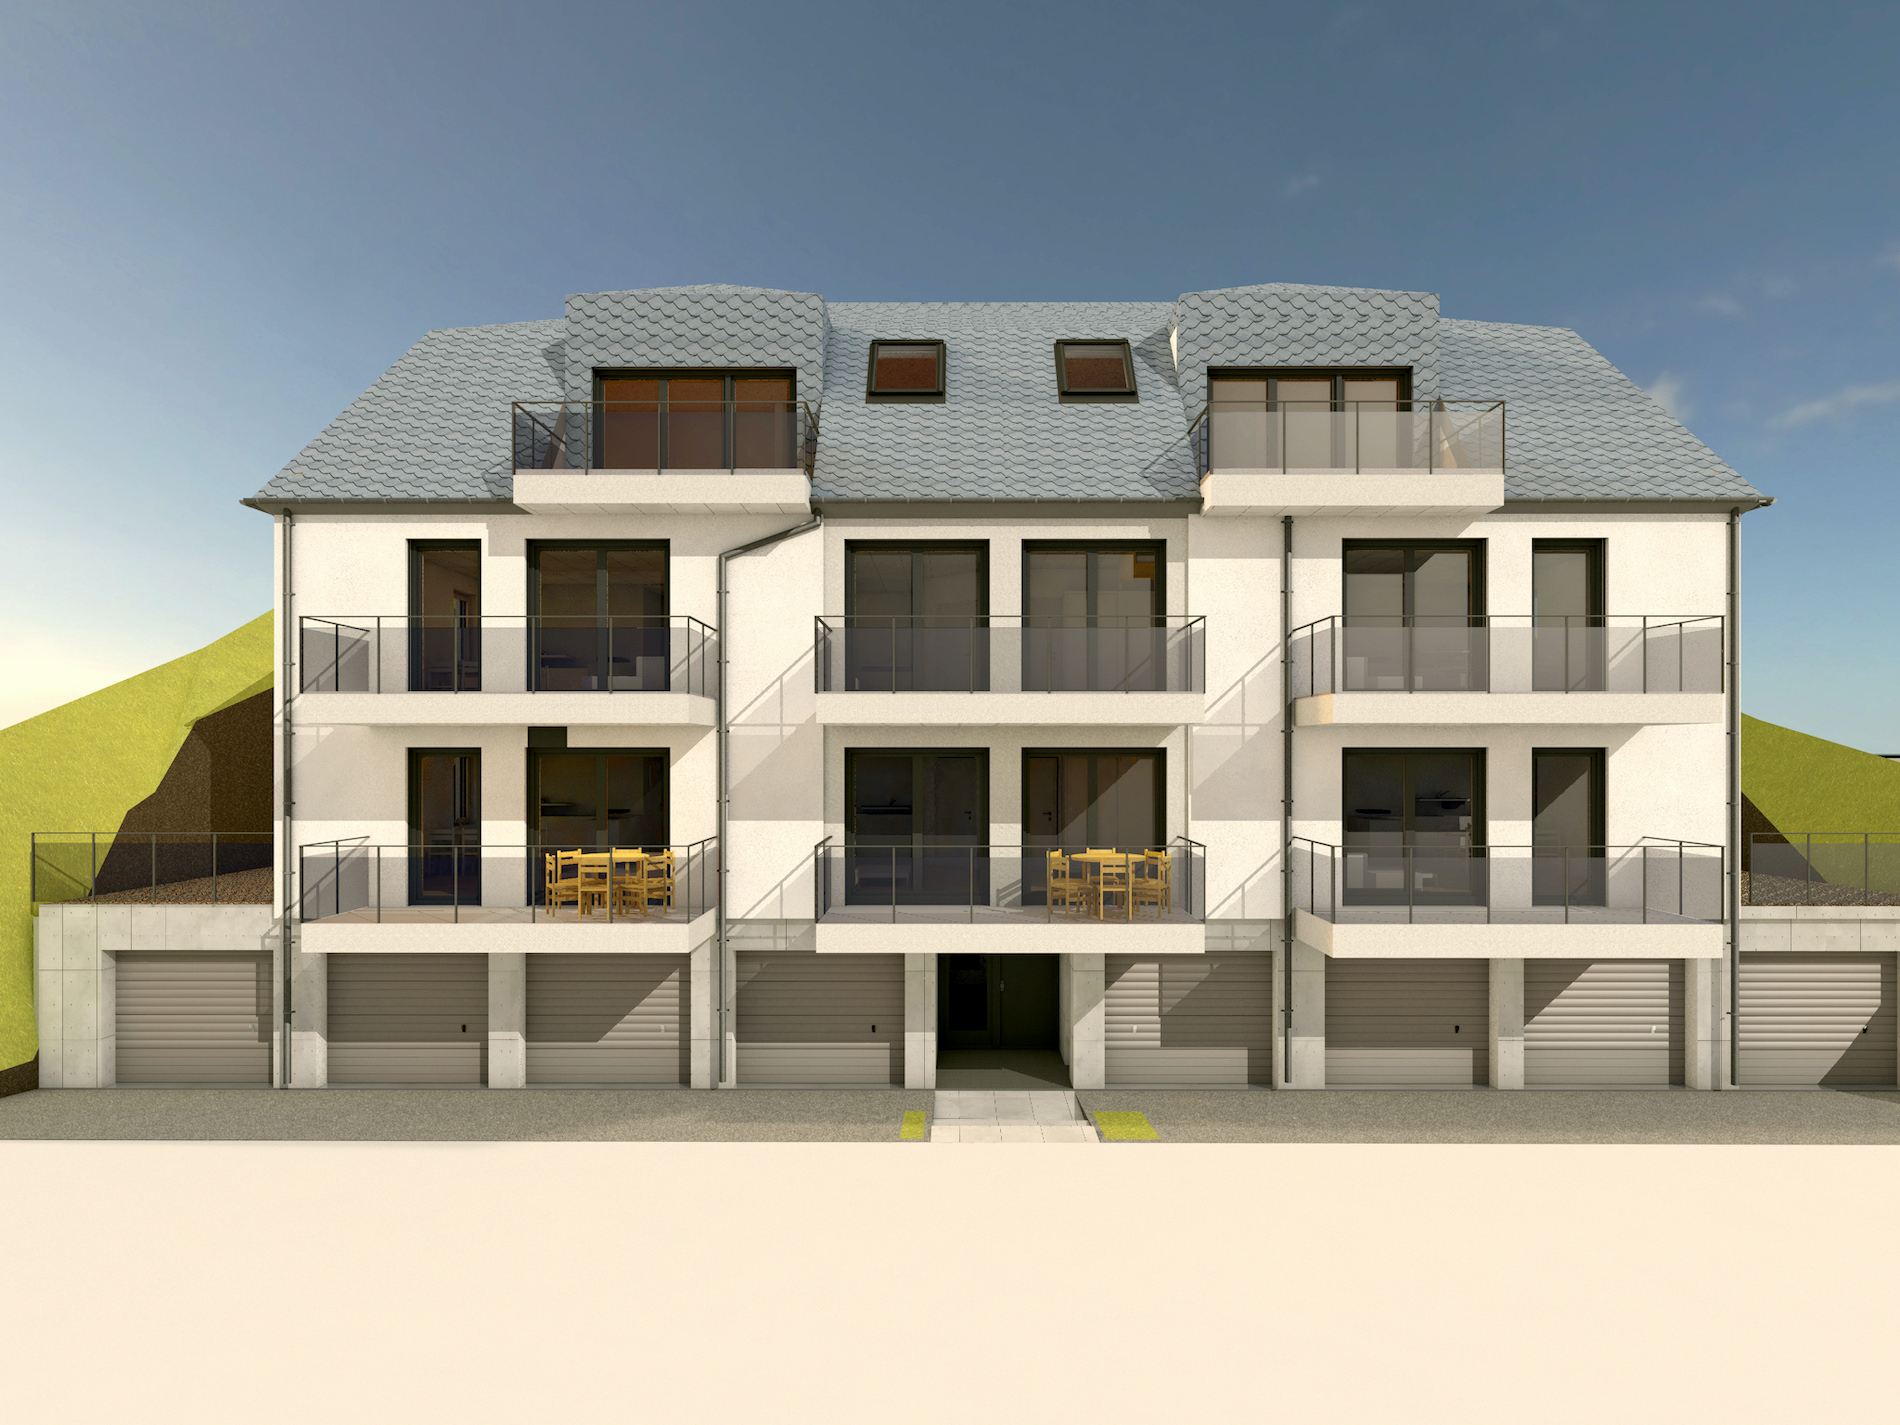 Plan_Familienhaus